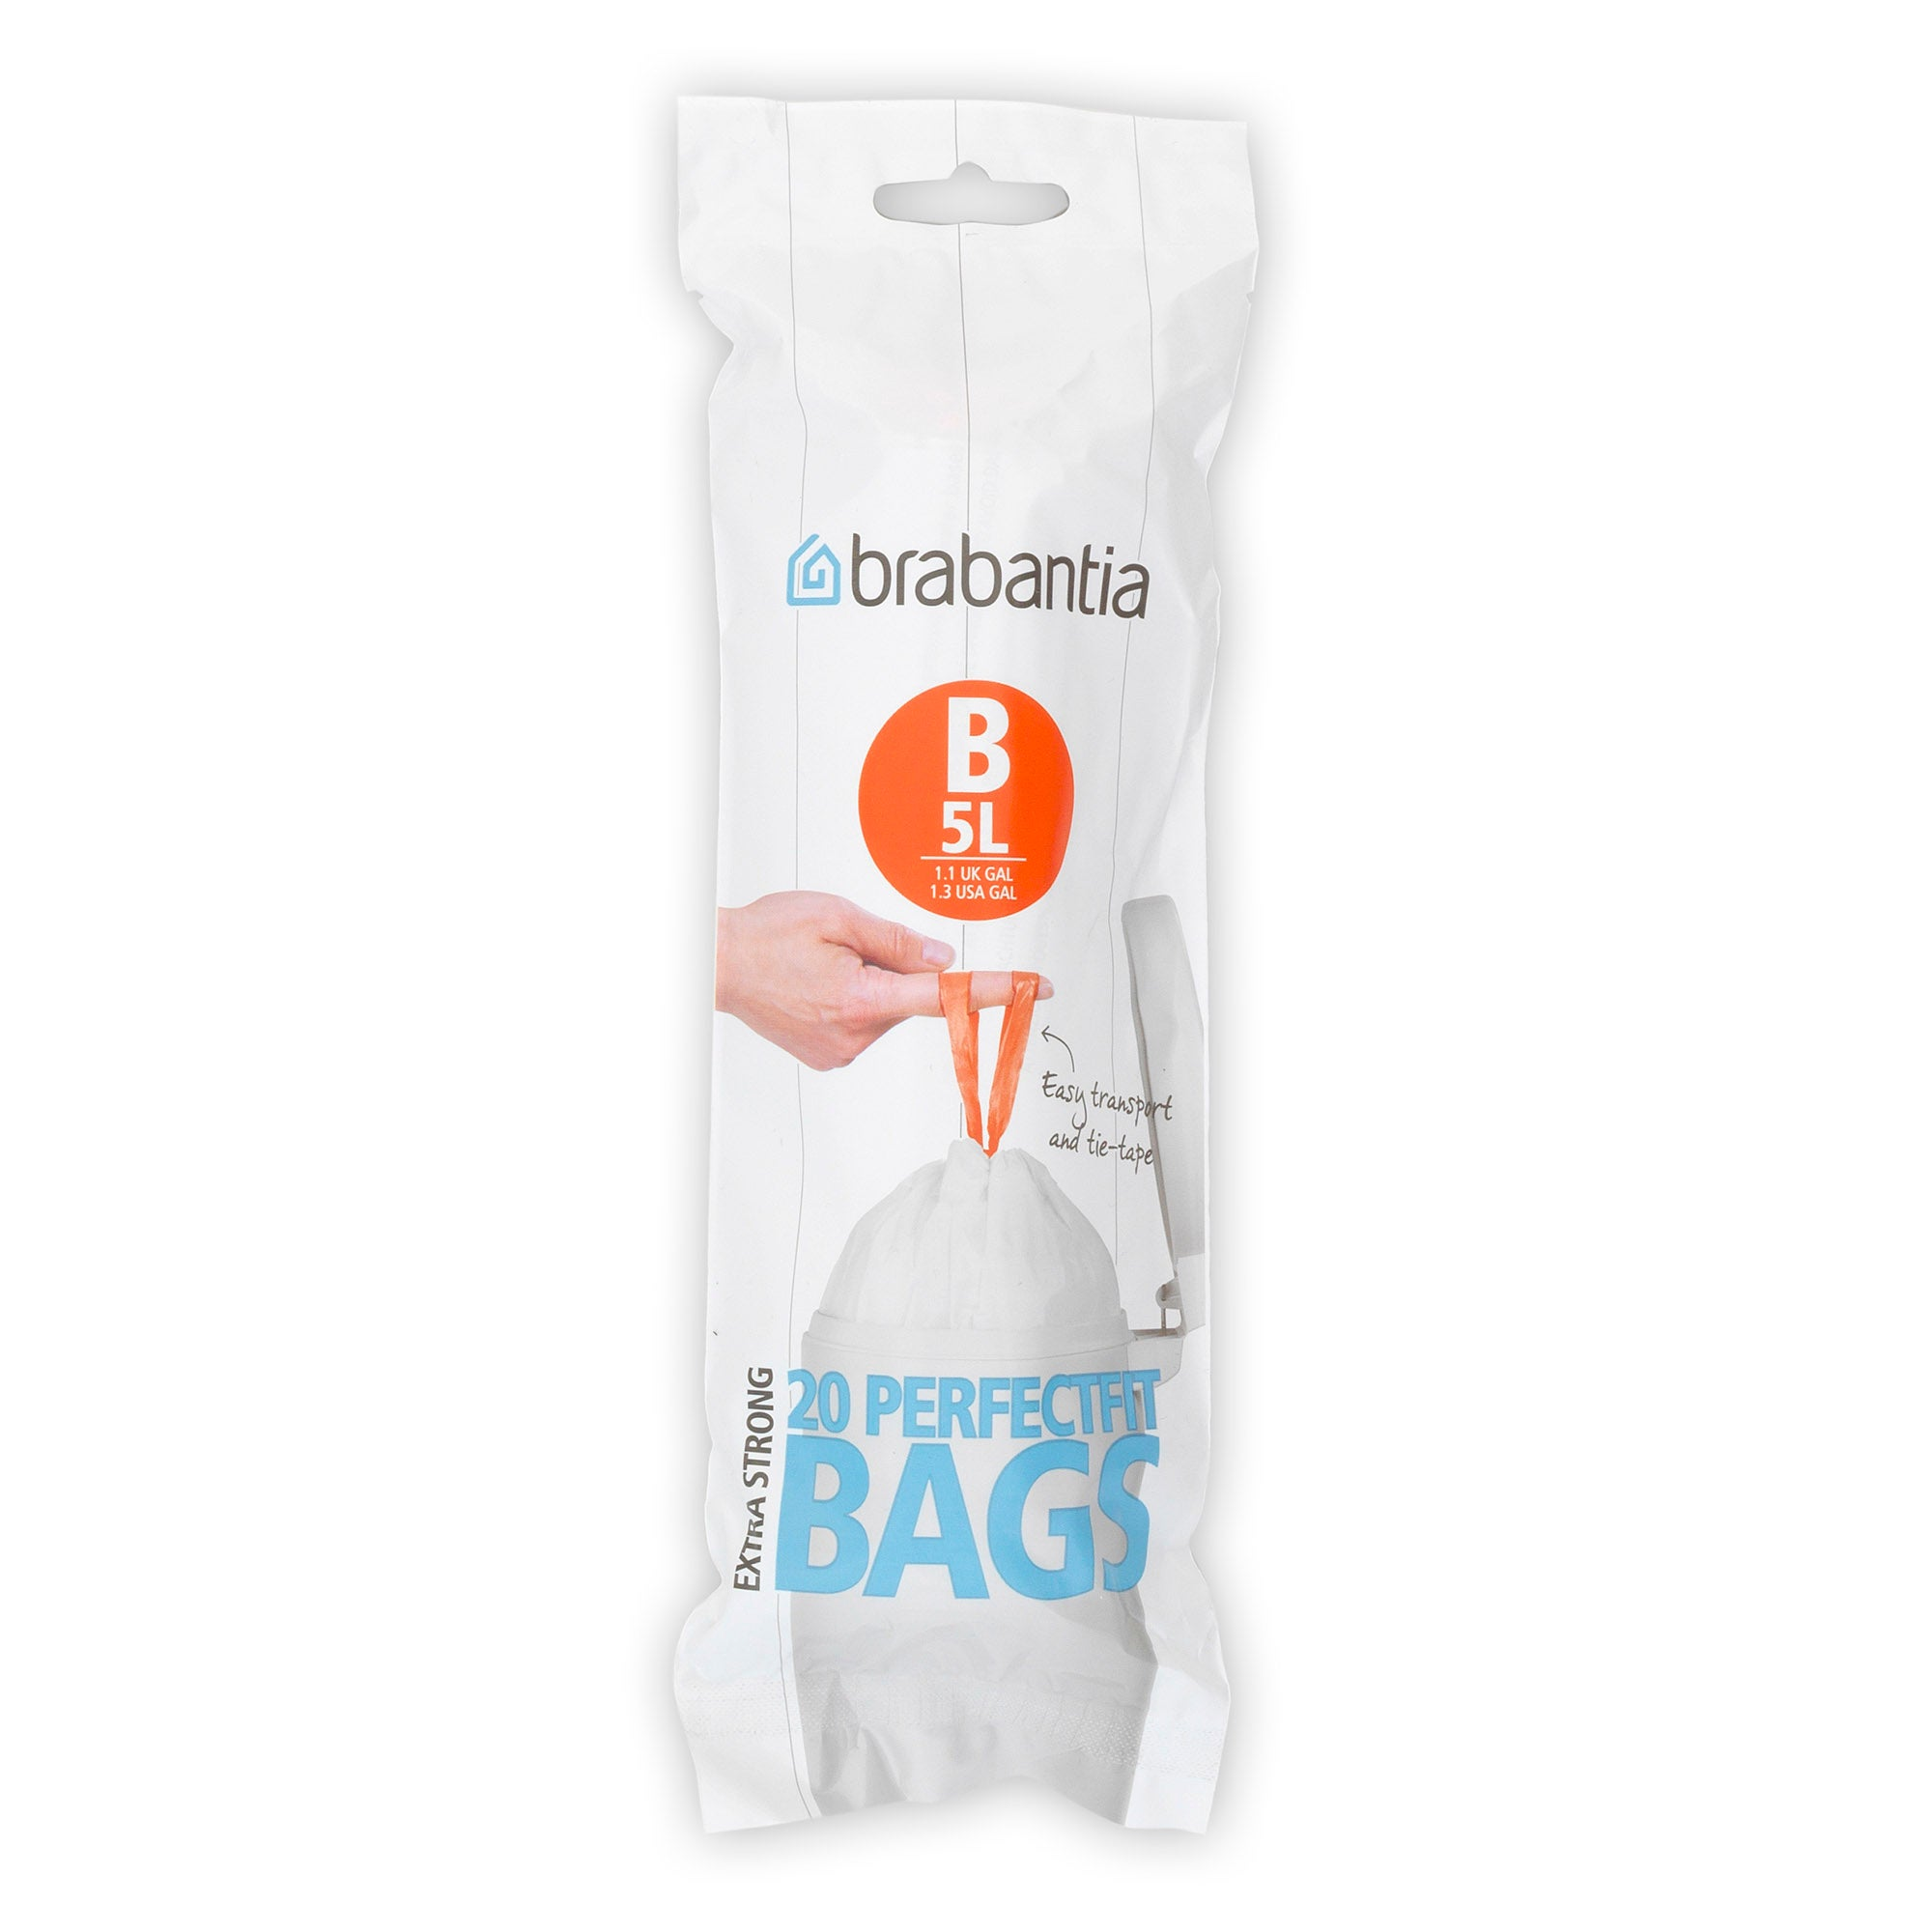 Brabantia 5 Litre Waste Bags